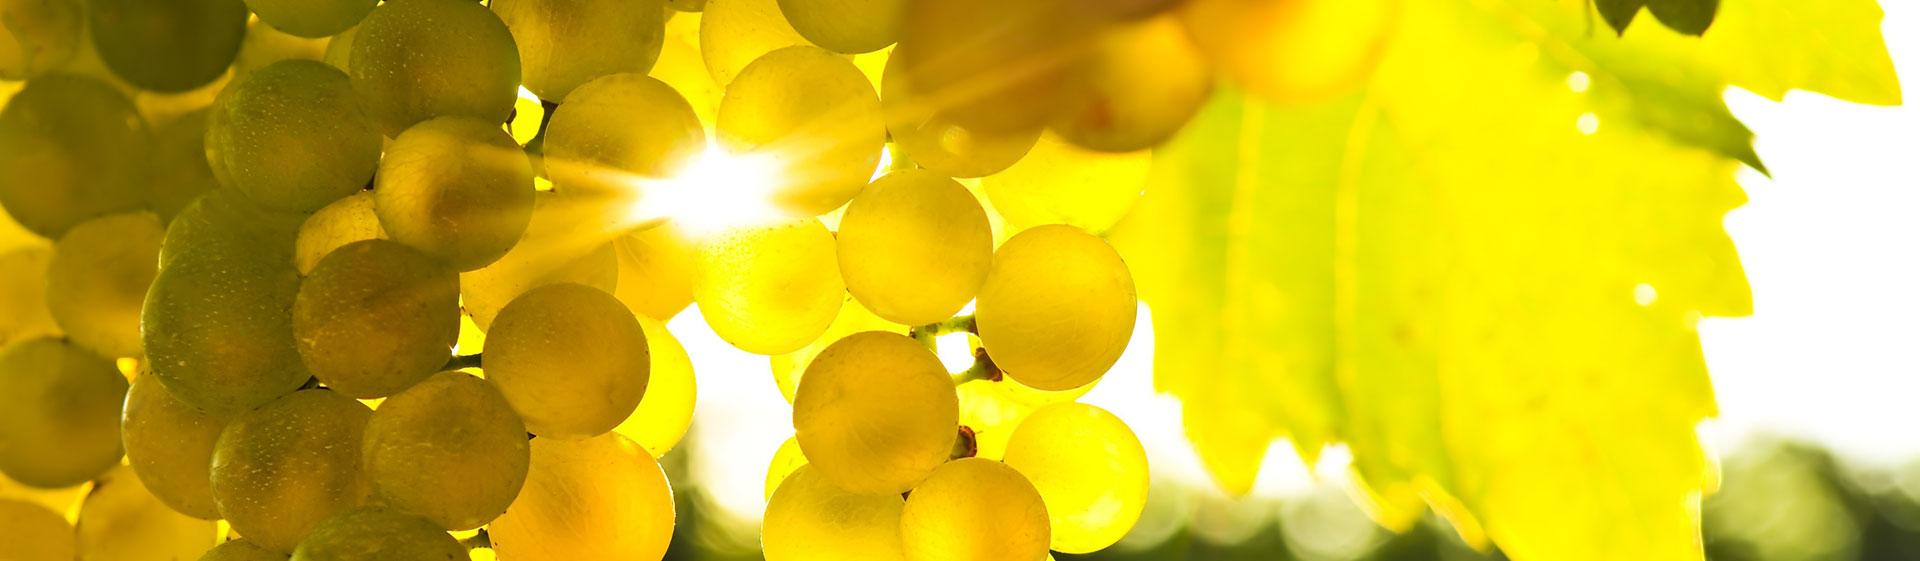 ochutnávka tokajského vína z juhoslovenských viníc vo vinotéke Forvin